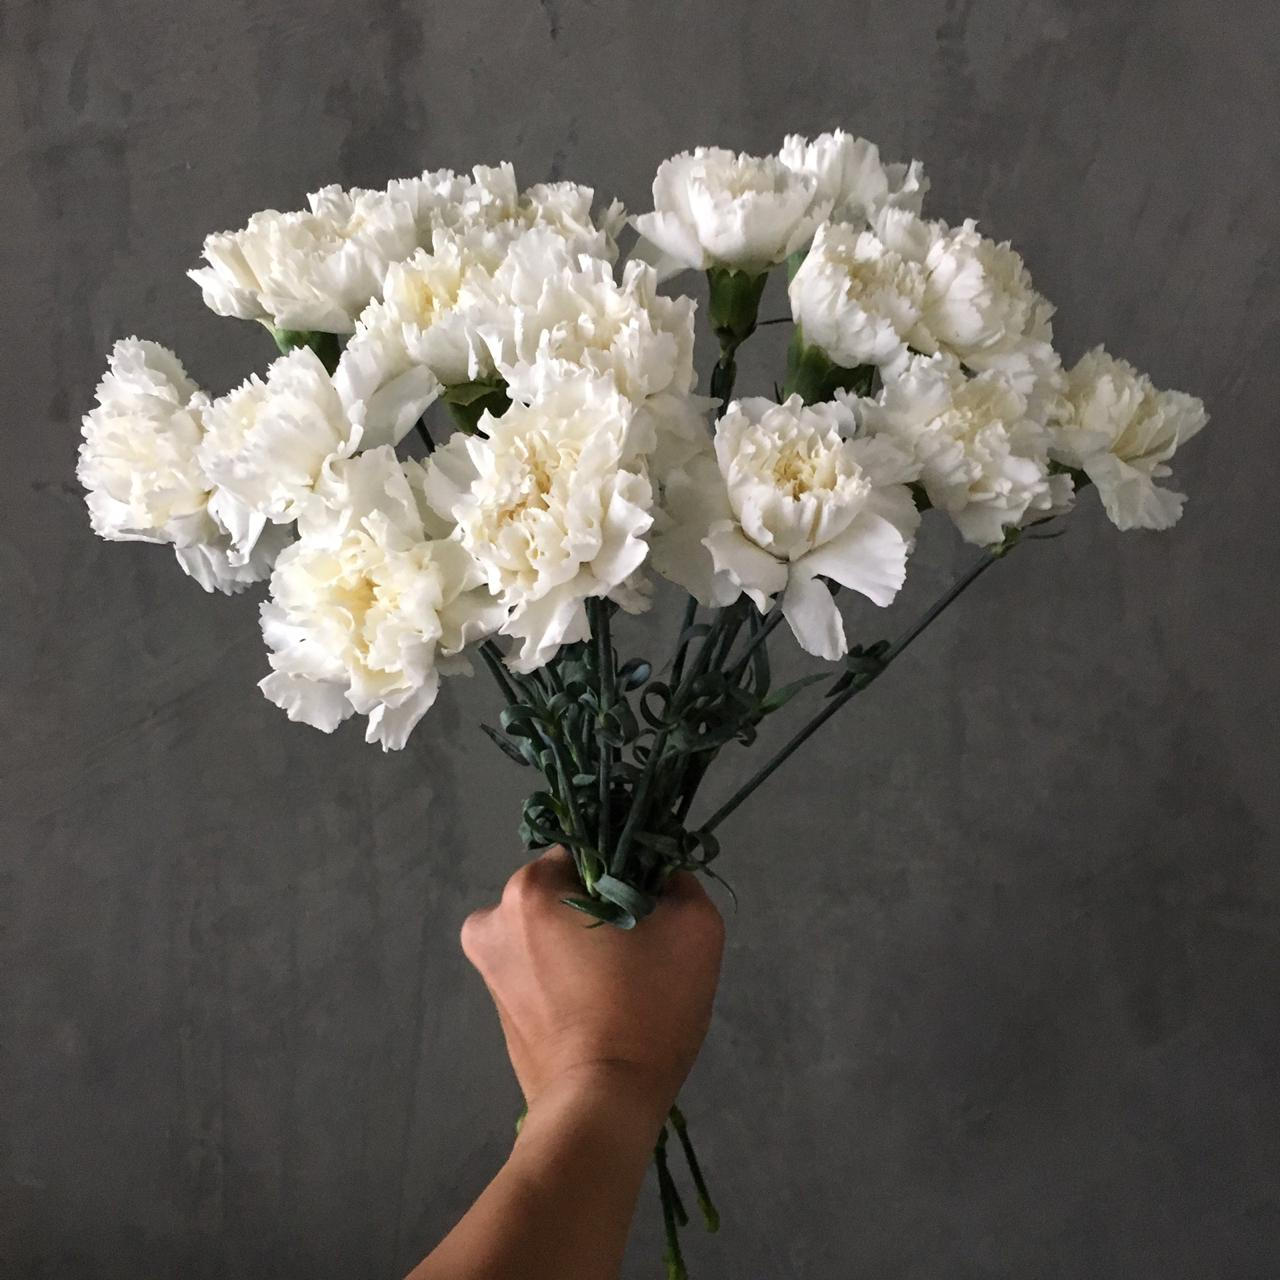 Carnation White 'Wholesale Flowers'